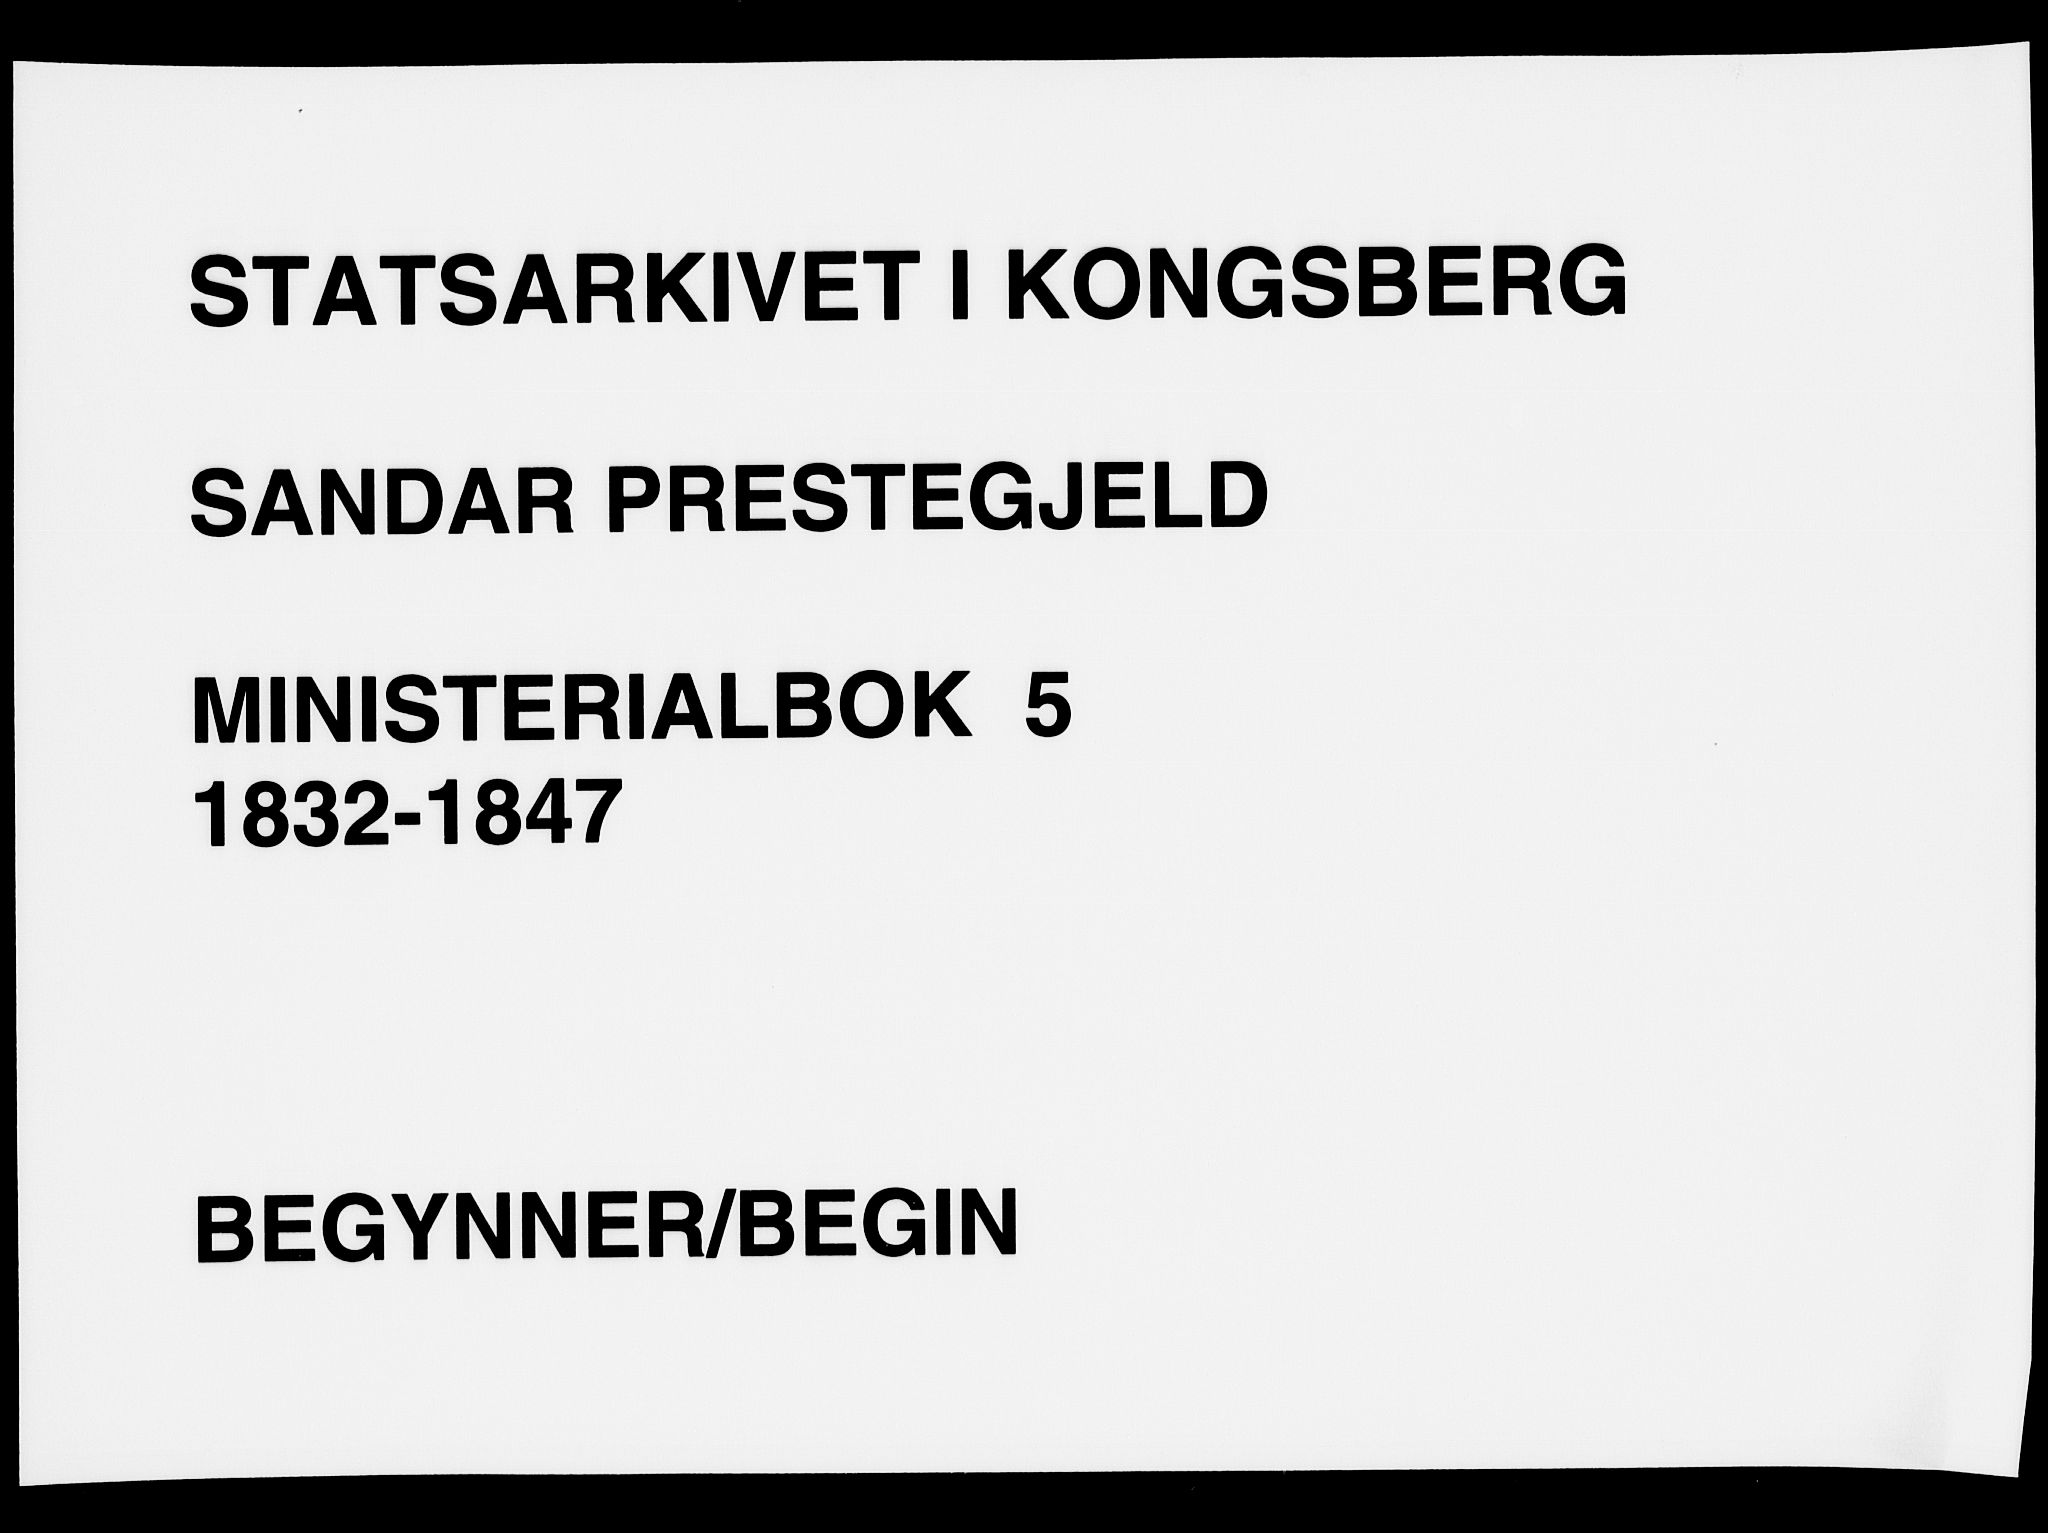 SAKO, Sandar kirkebøker, F/Fa/L0005: Ministerialbok nr. 5, 1832-1847